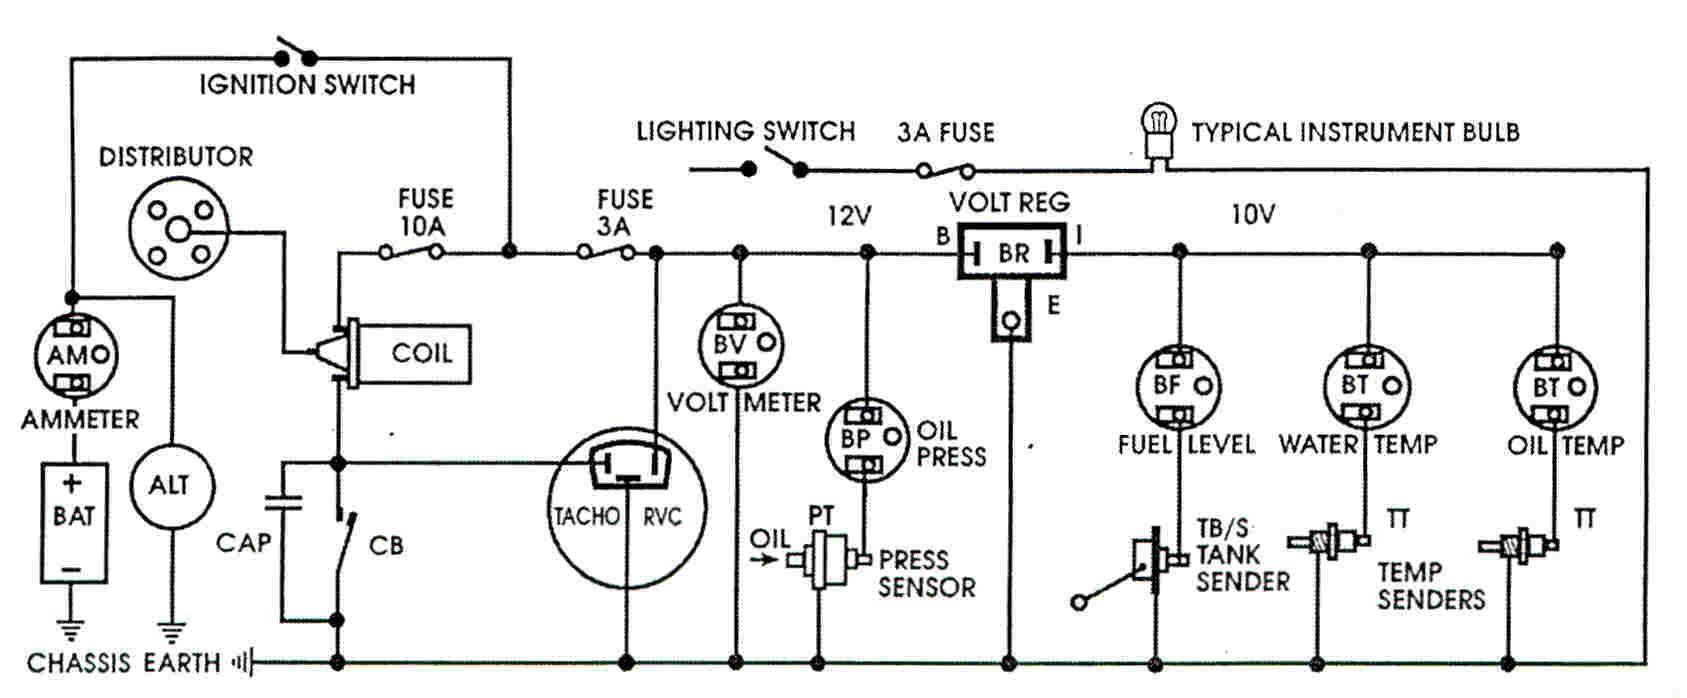 medium resolution of thrifty voltage regulator circuit diagram wiring diagram week thrifty voltage regulator circuit diagram